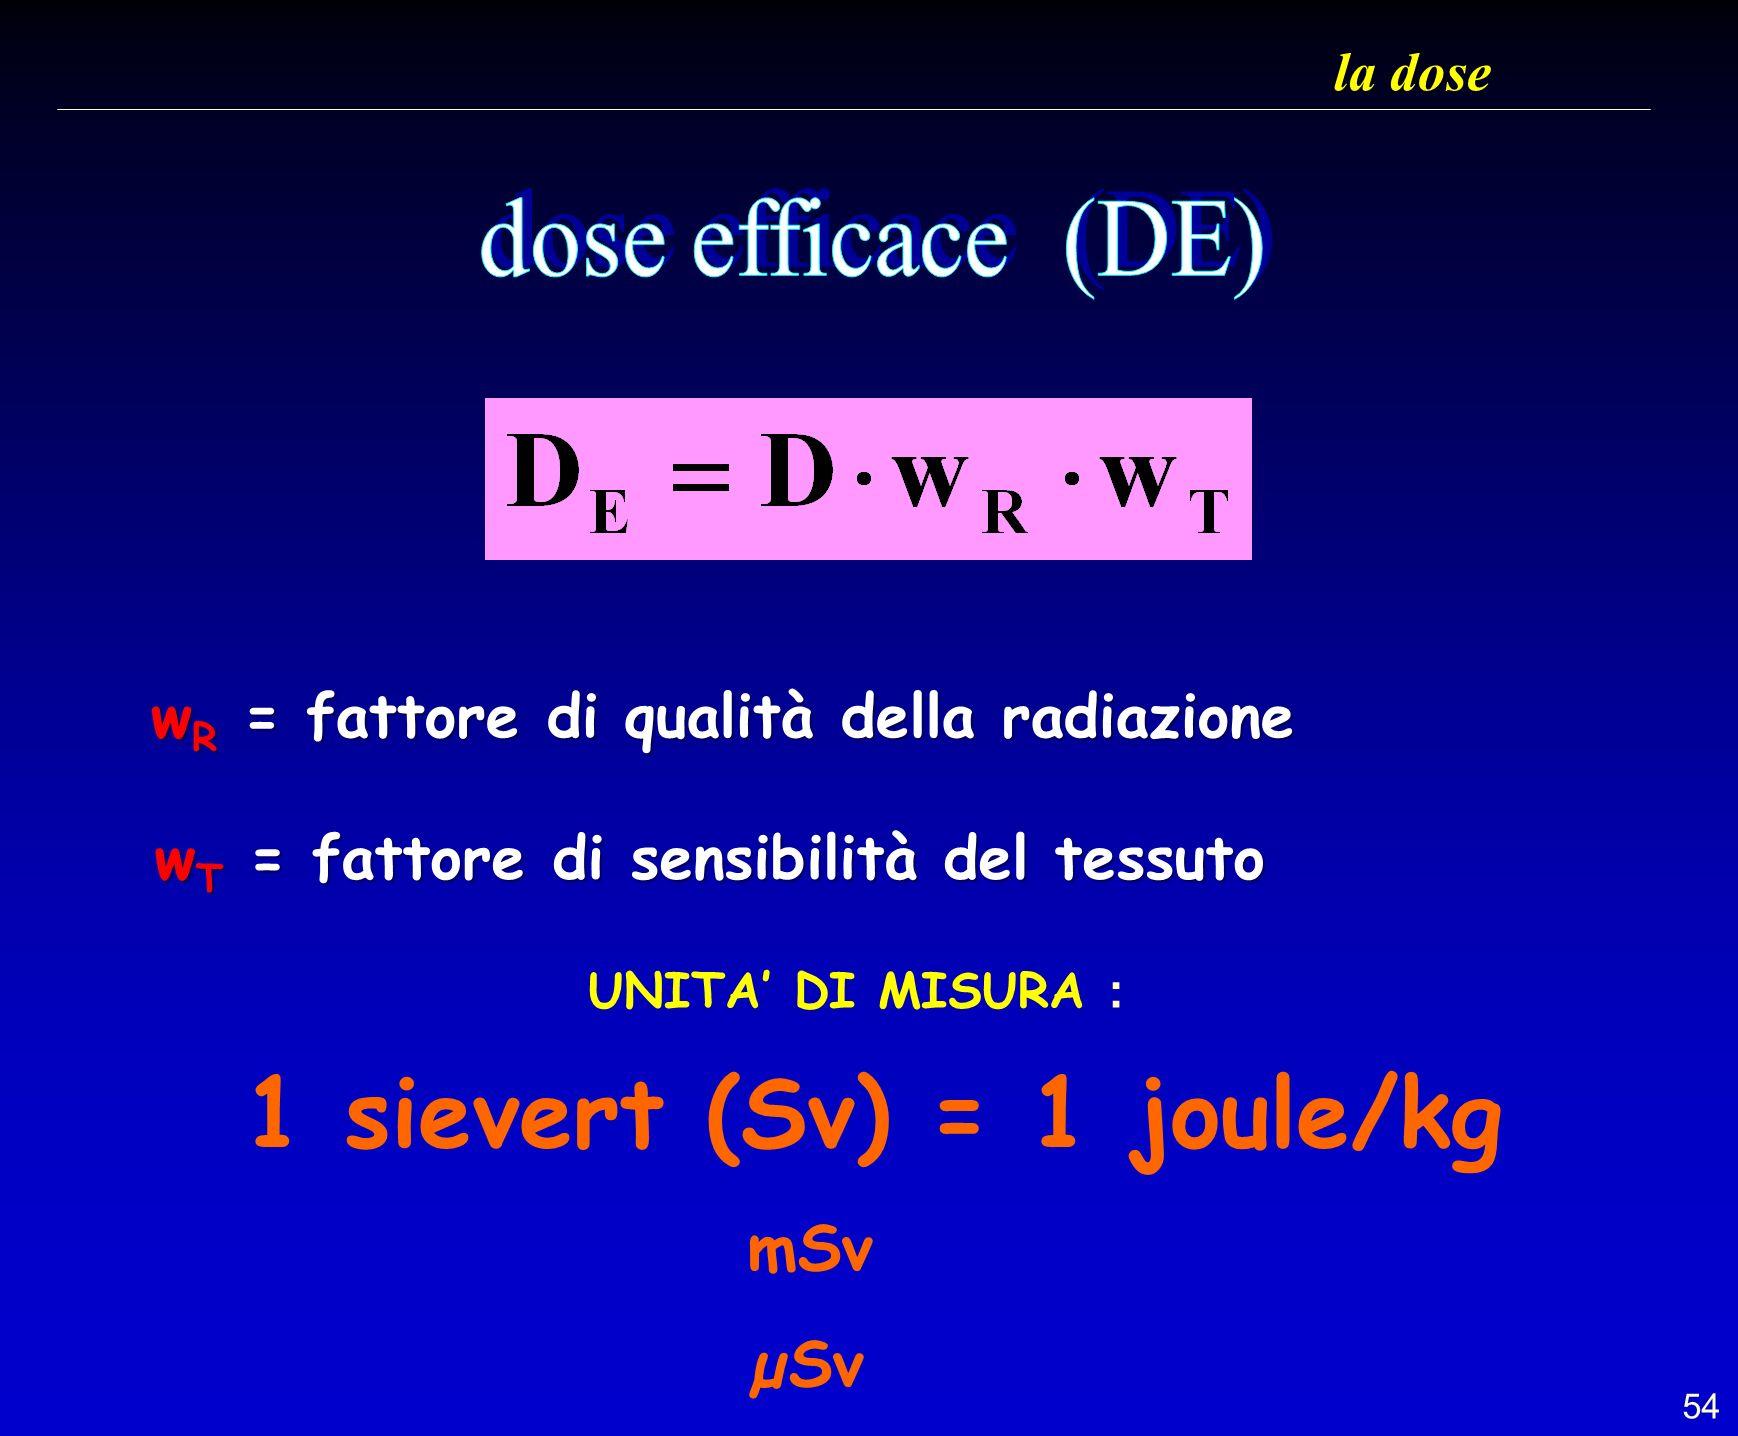 1 sievert (Sv) = 1 joule/kg